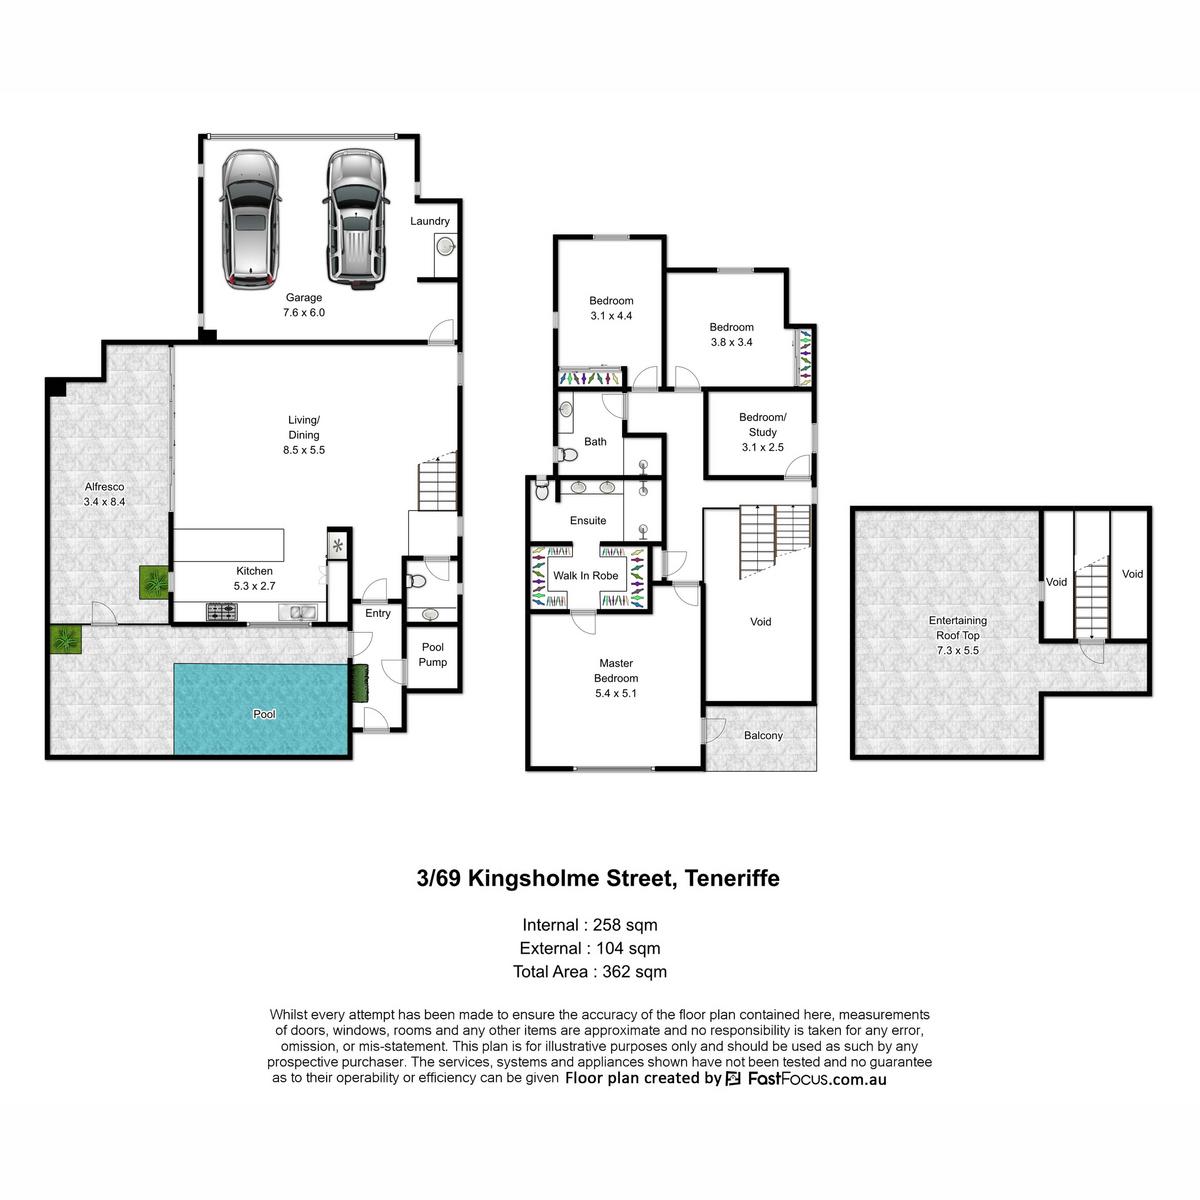 3 / 69 Kingsholme Street, Teneriffe QLD 4005 | Property for